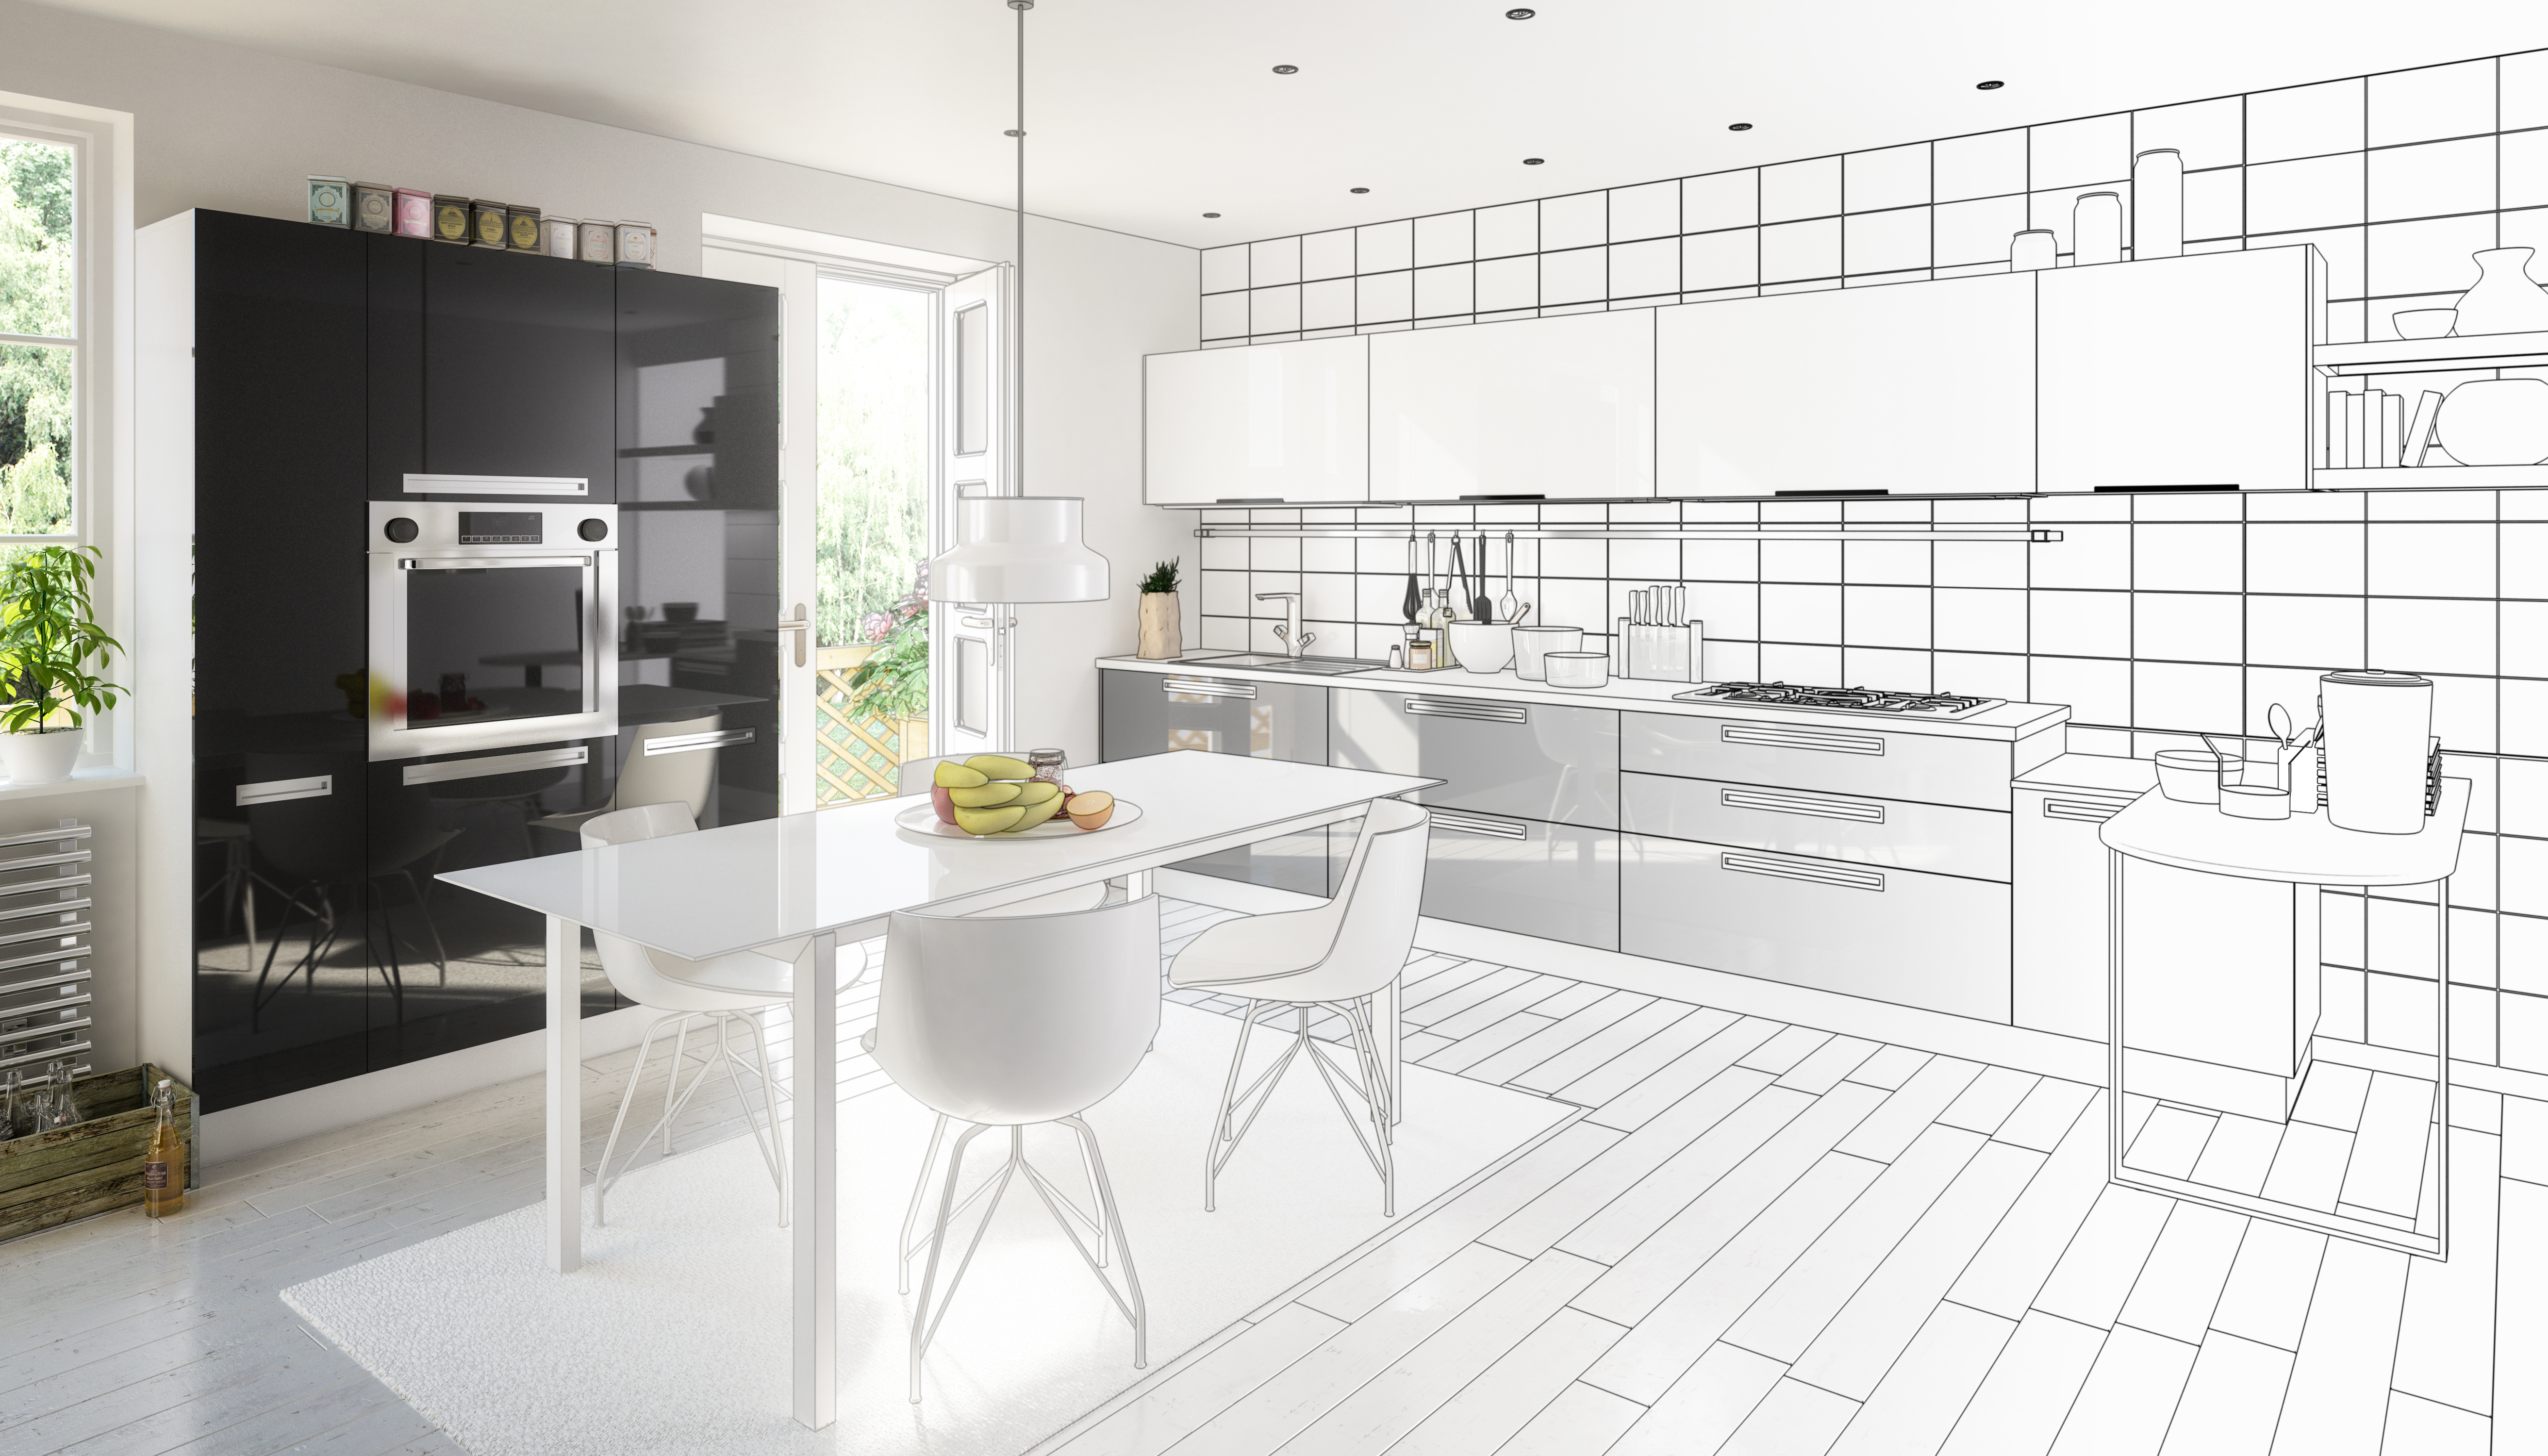 Kitchen modeling